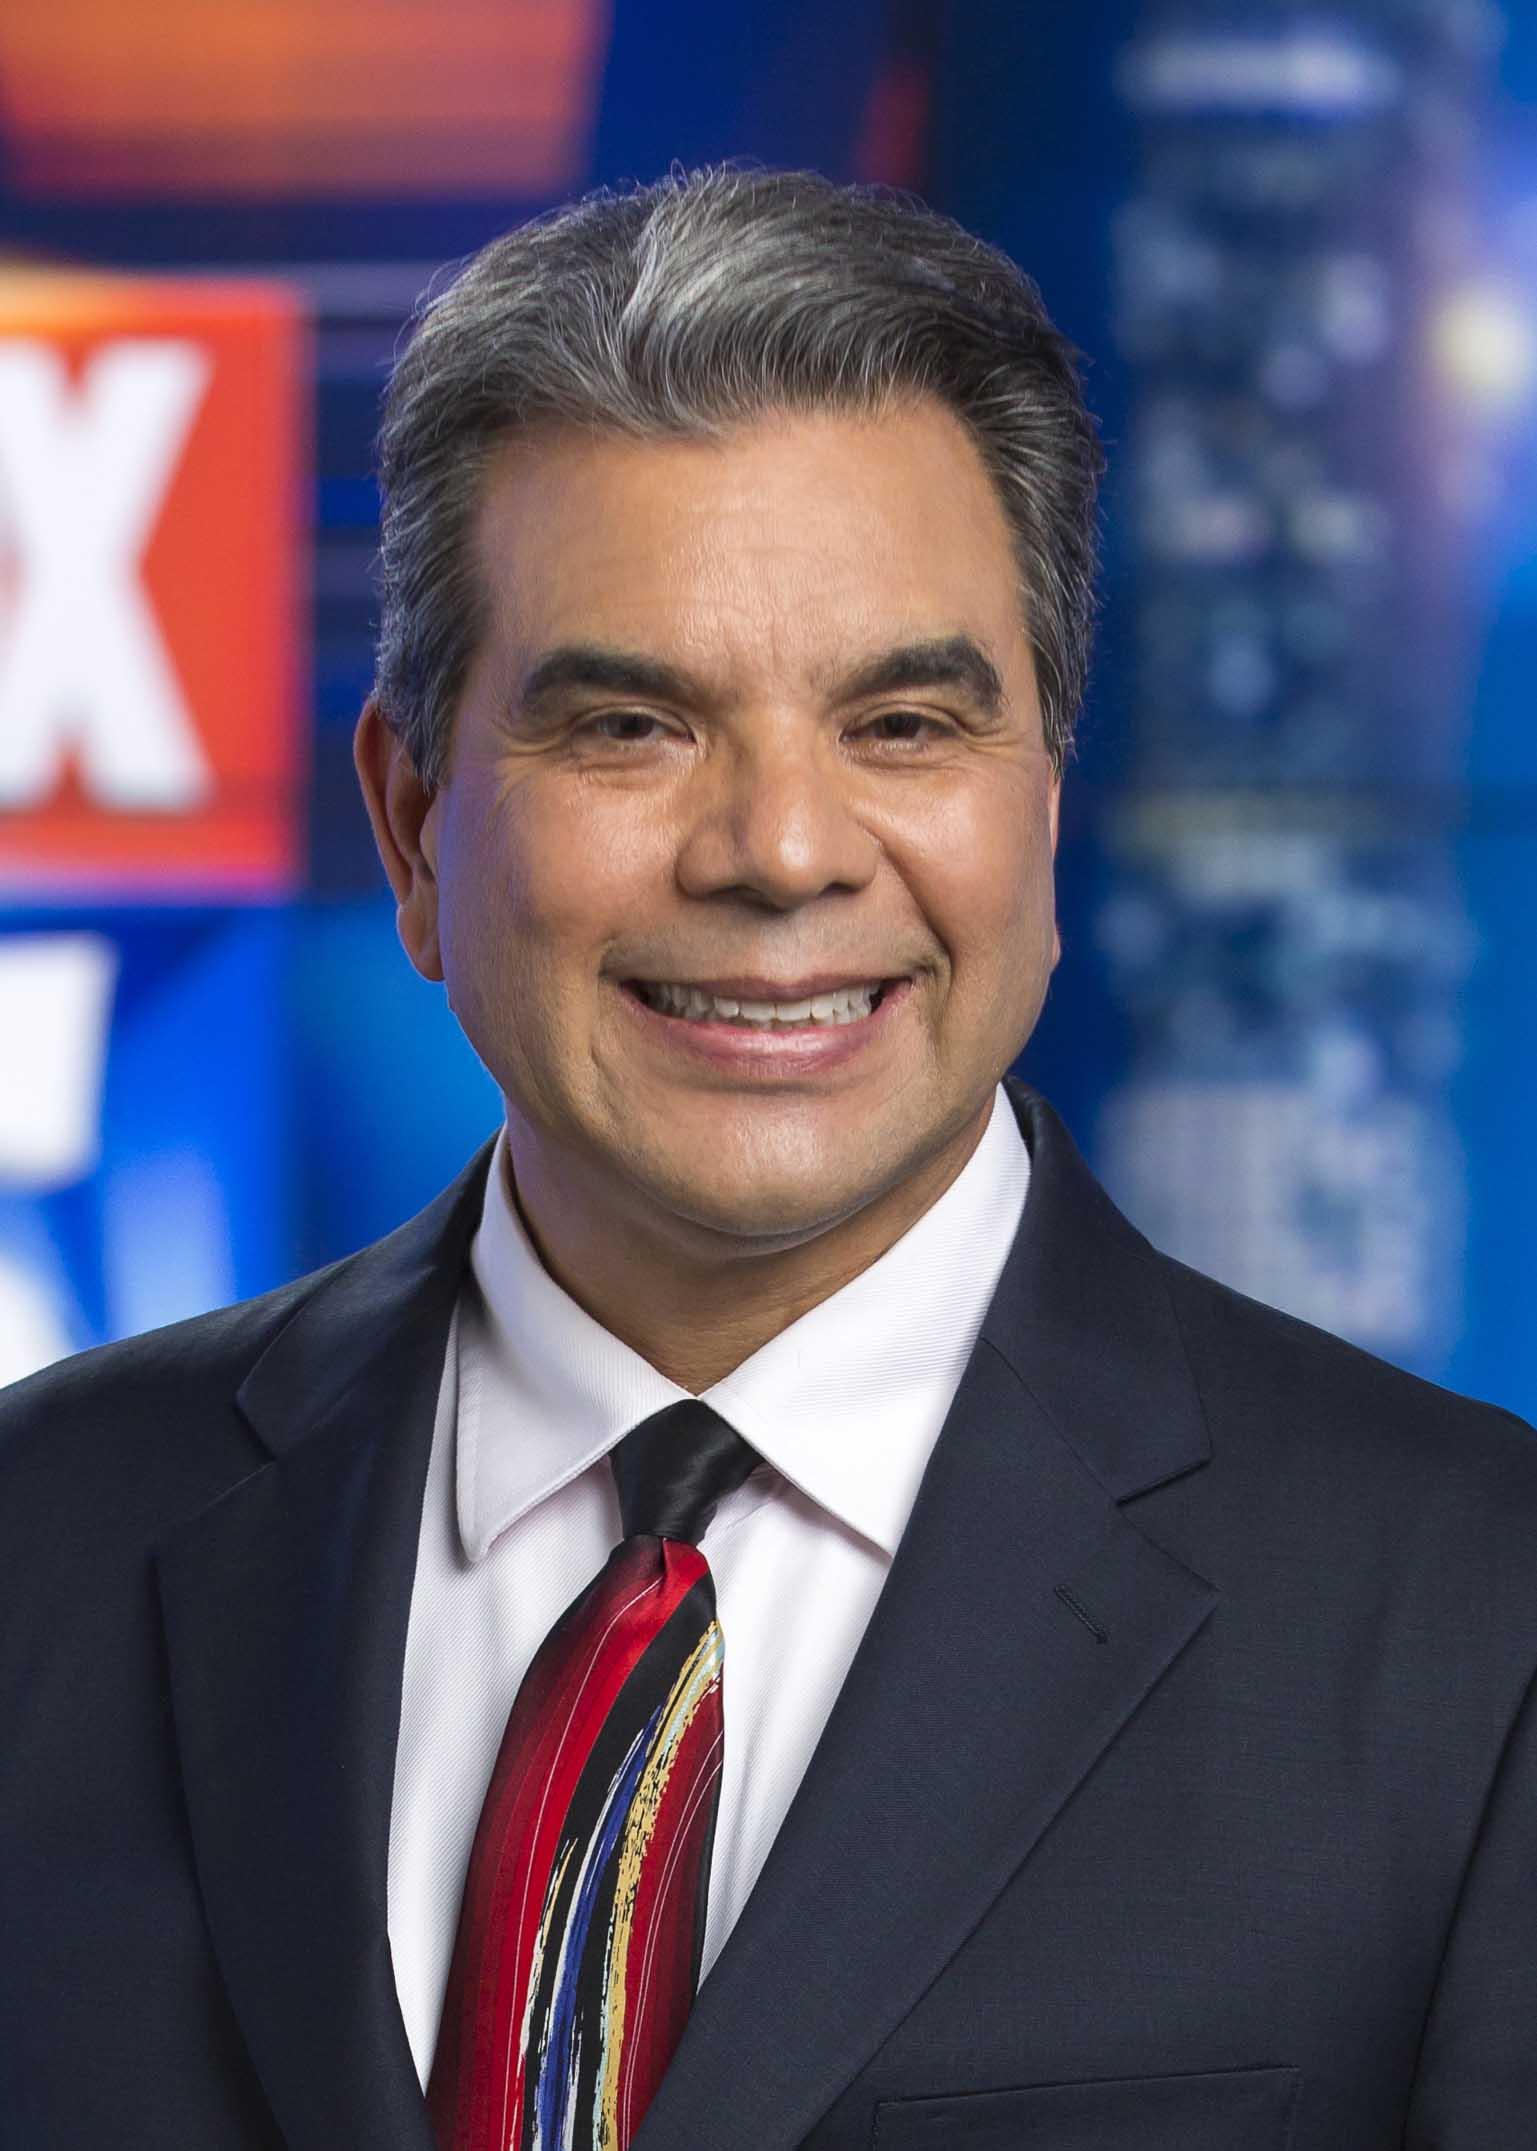 George Franco